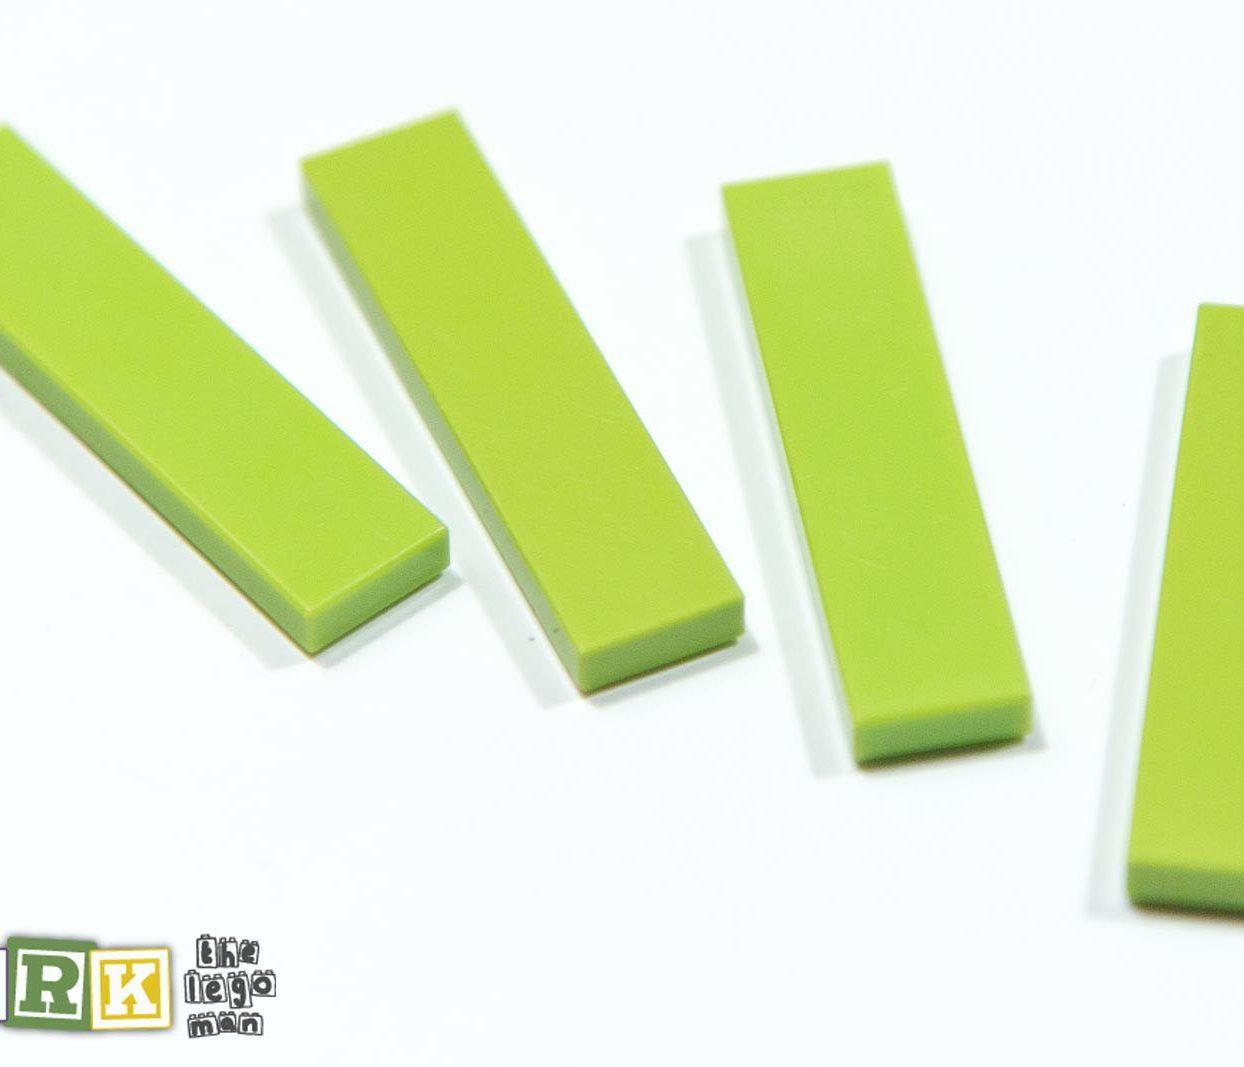 4164021 2431 Job Lot 4x Bright Yellow Green 1x4 Flat Tile